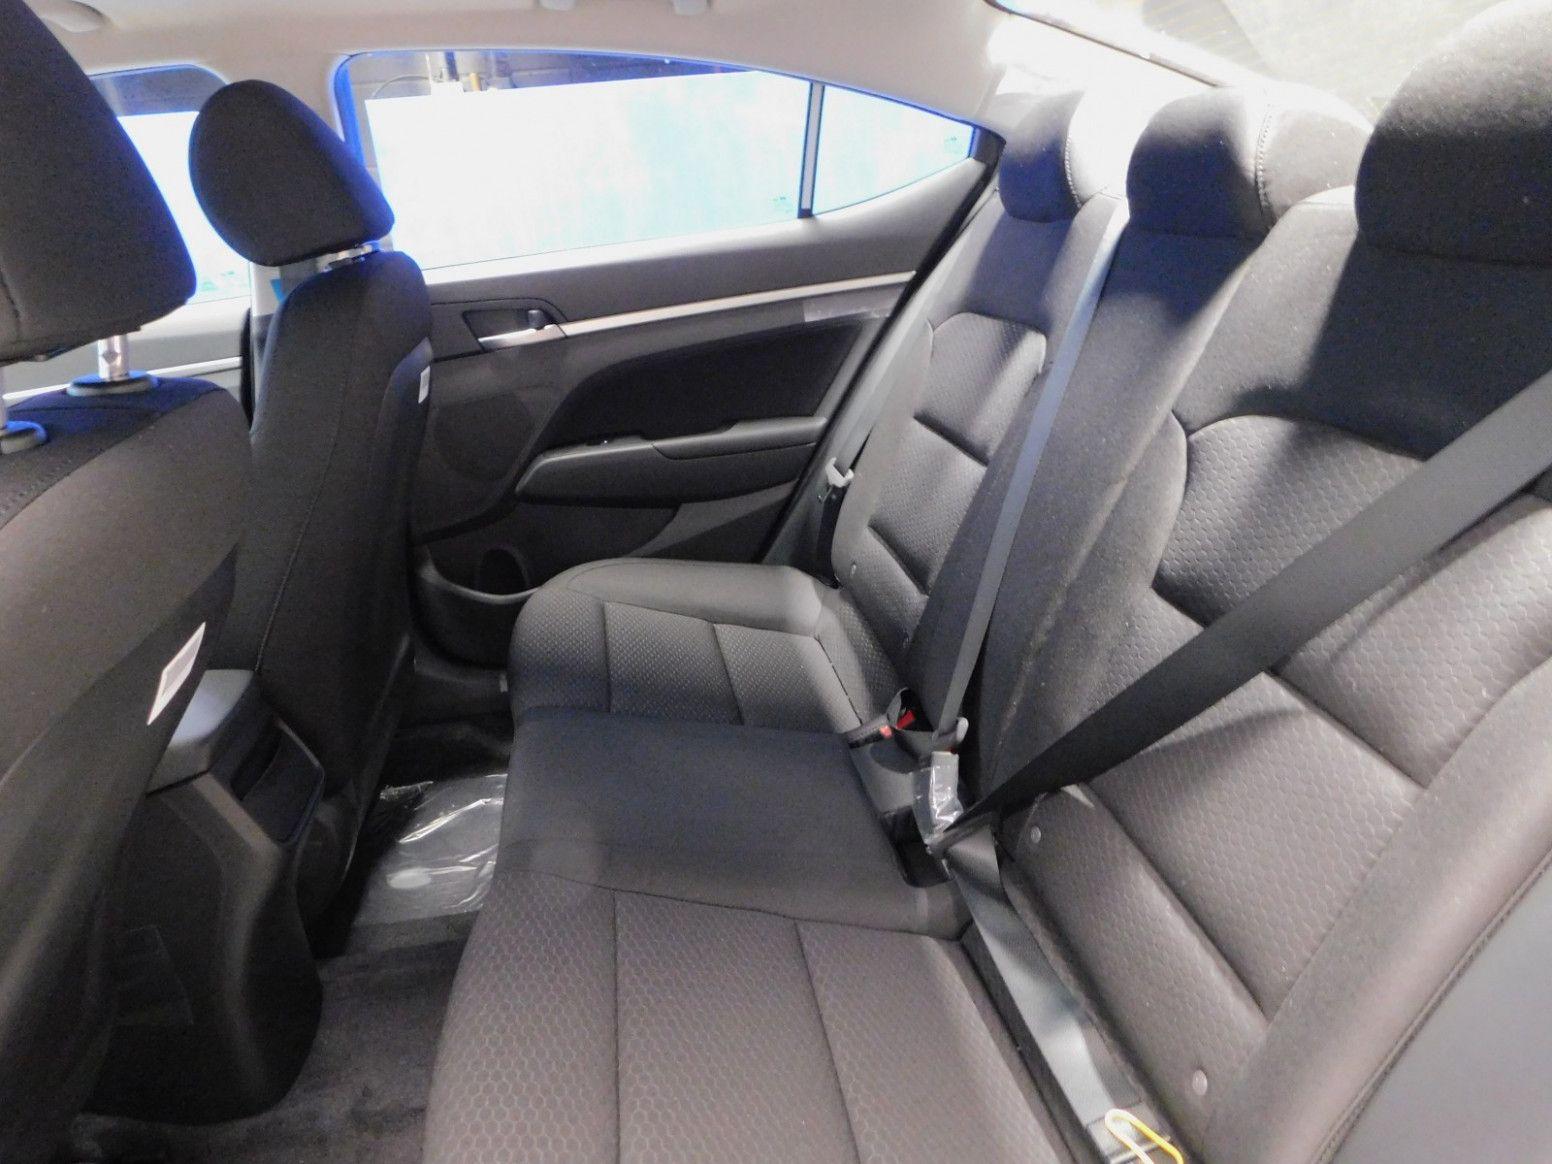 2020 Hyundai Elantra Seat Covers Hyundai Elantra Elantra Hyundai